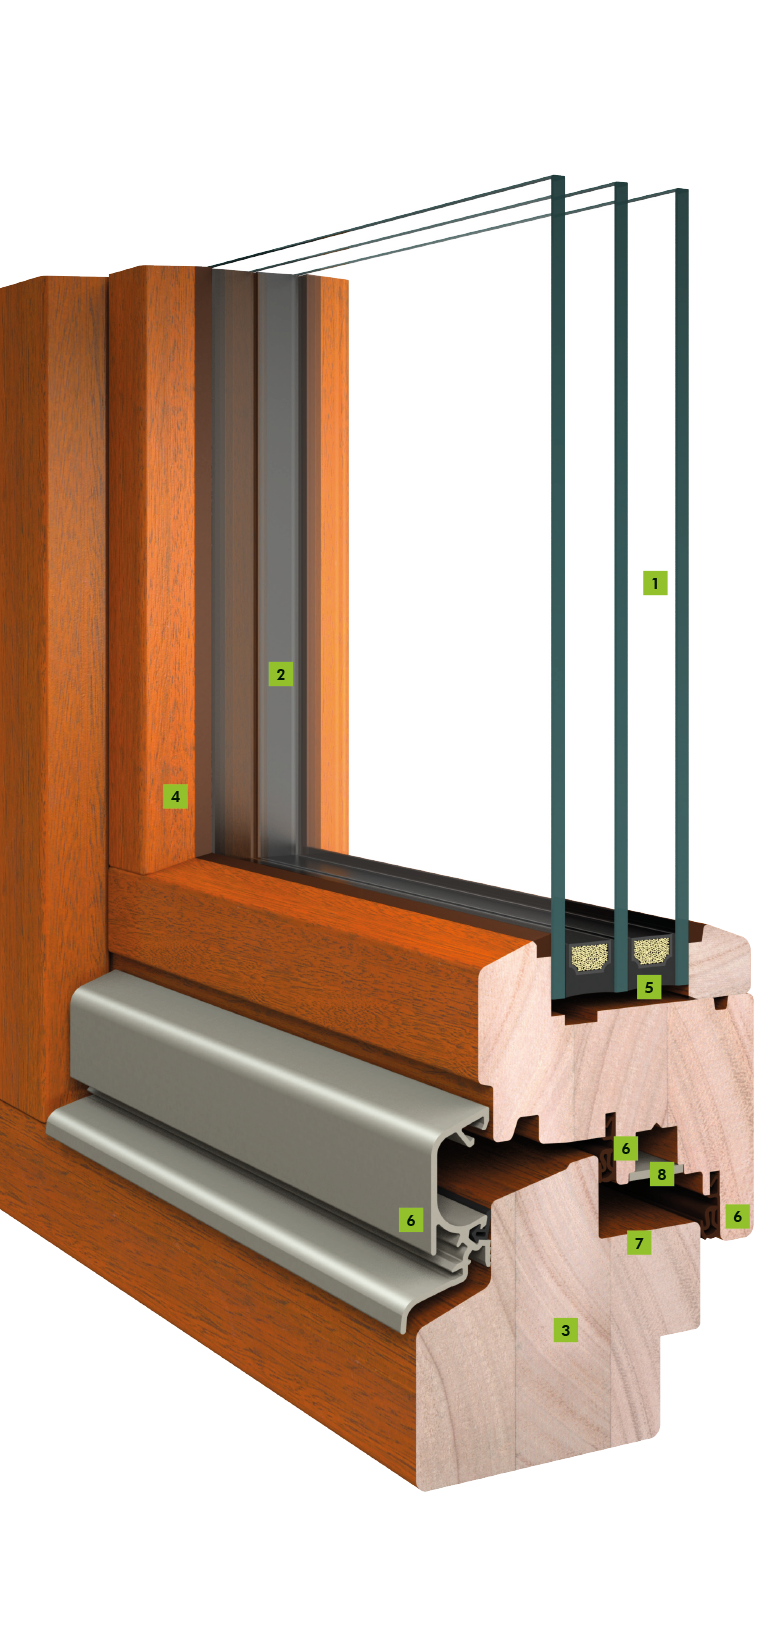 Holz Fenster mit 80 mm Bautiefe